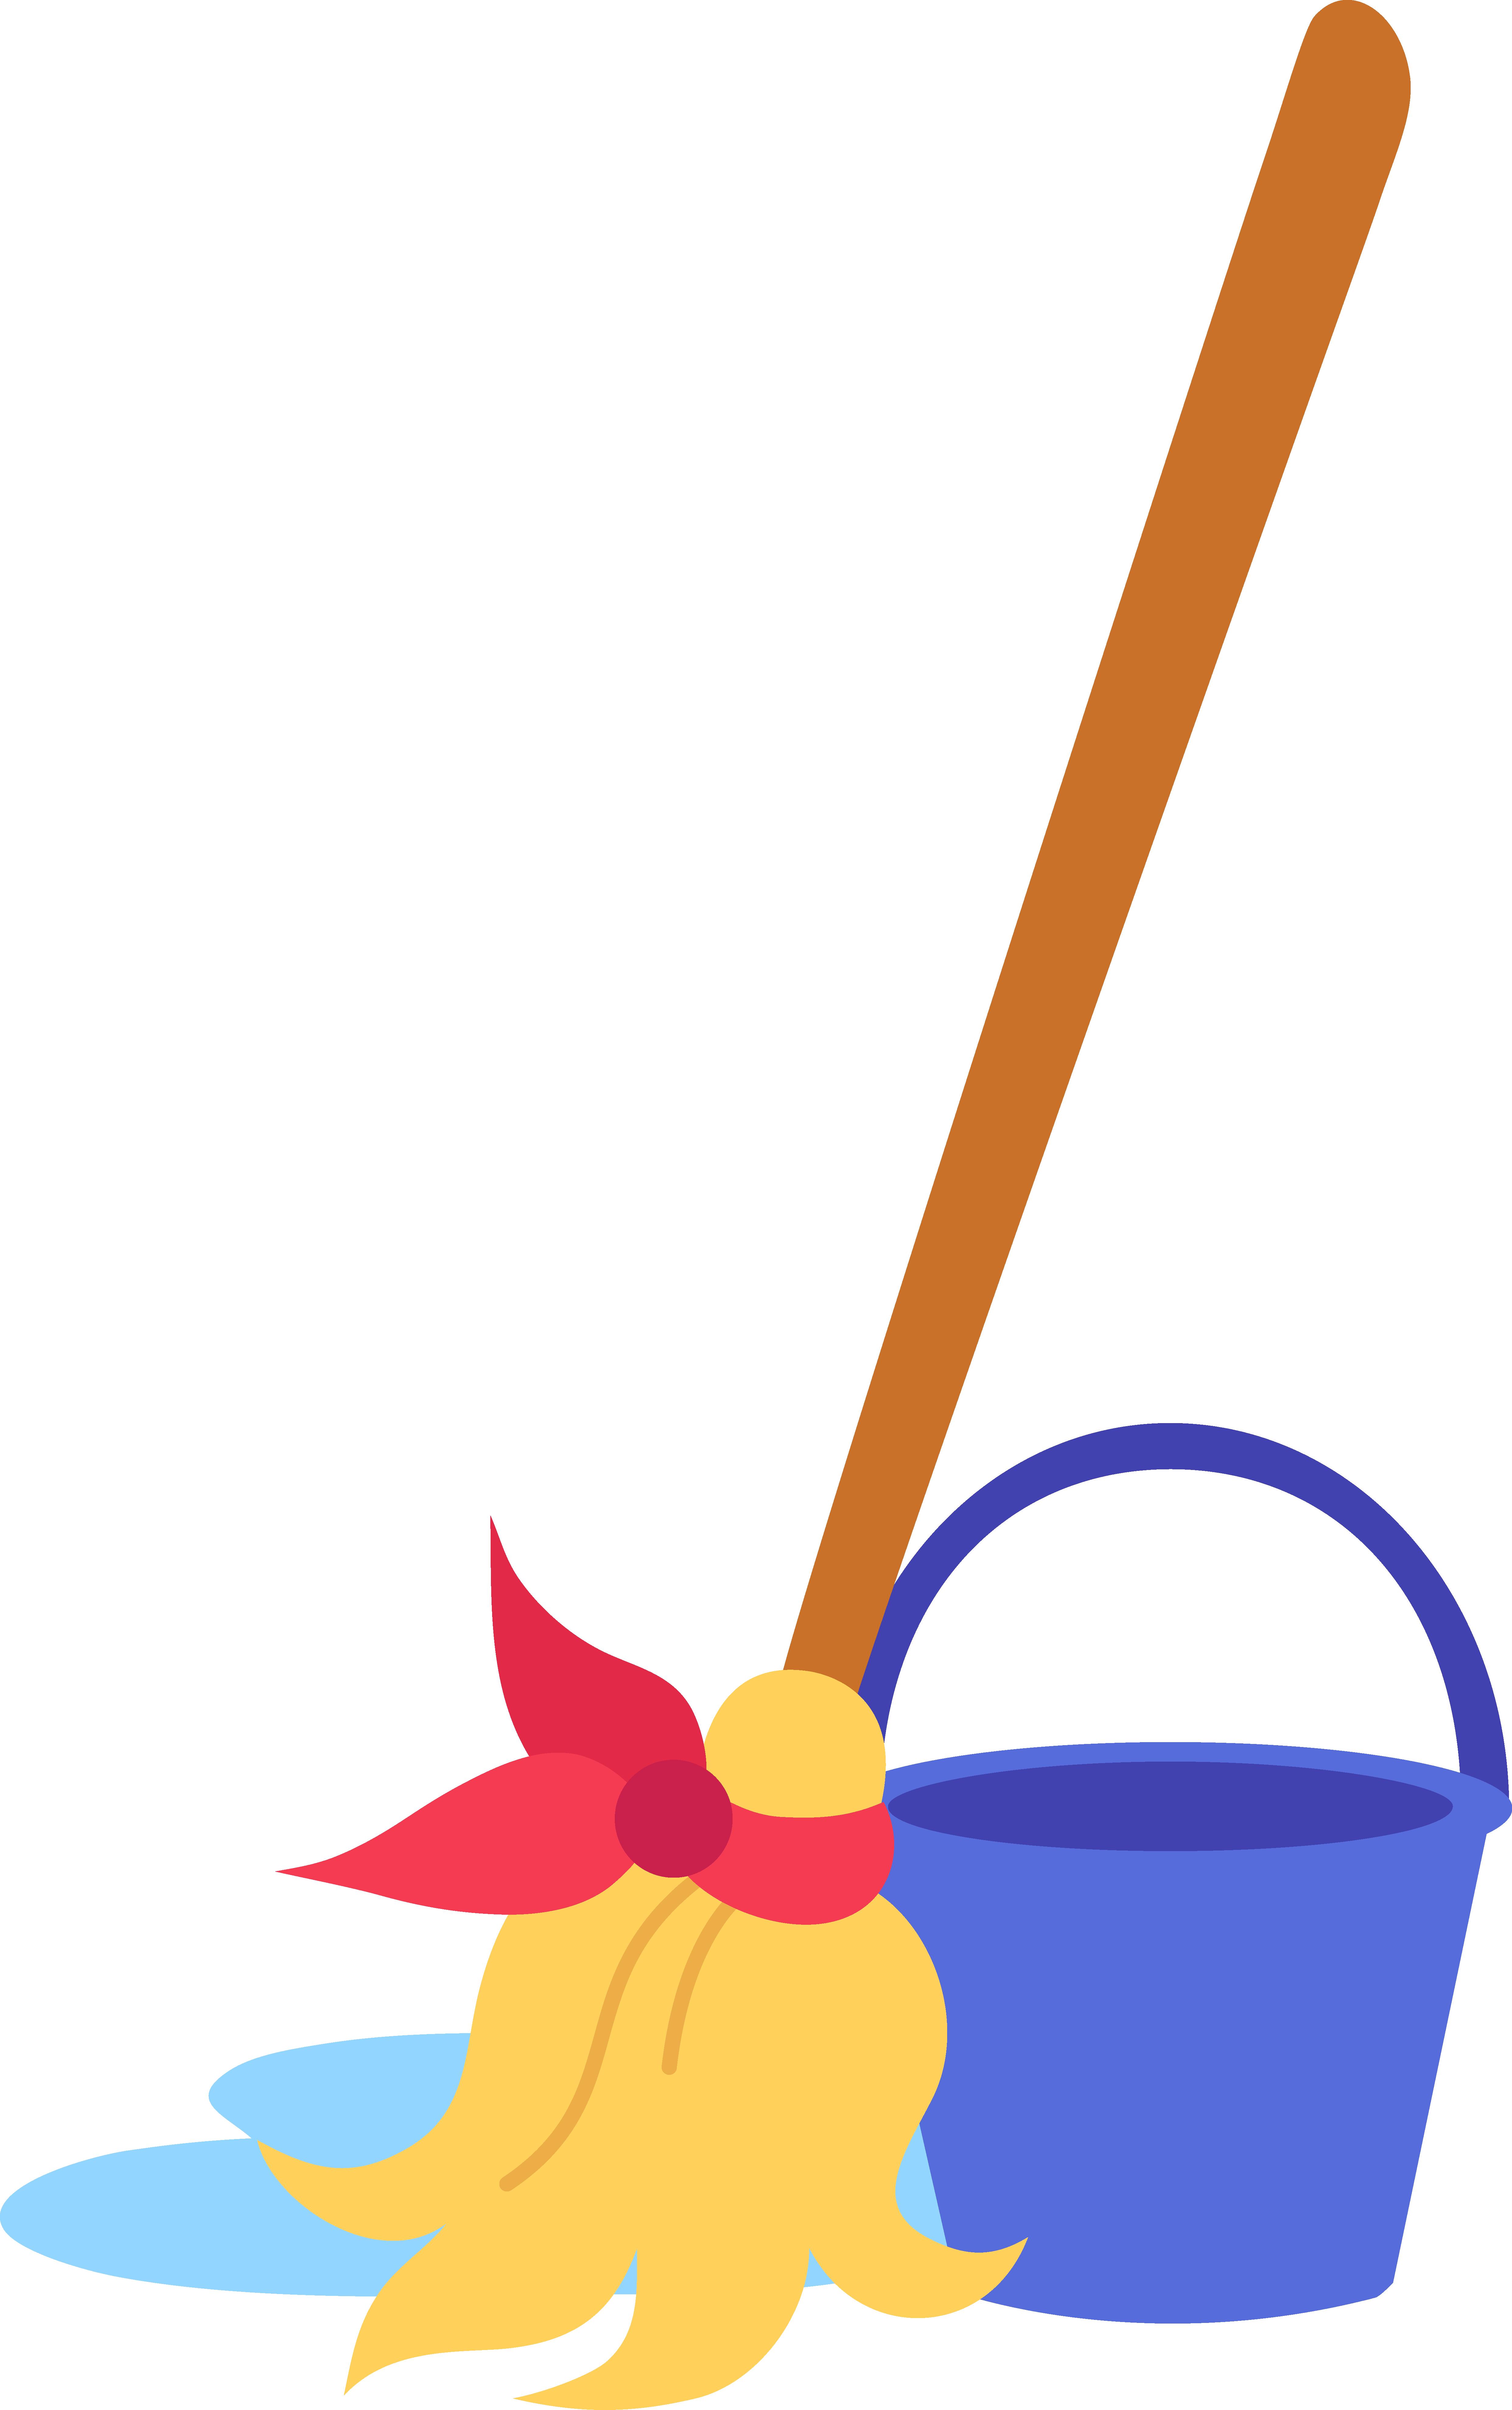 Mop and Bucket Clip Art